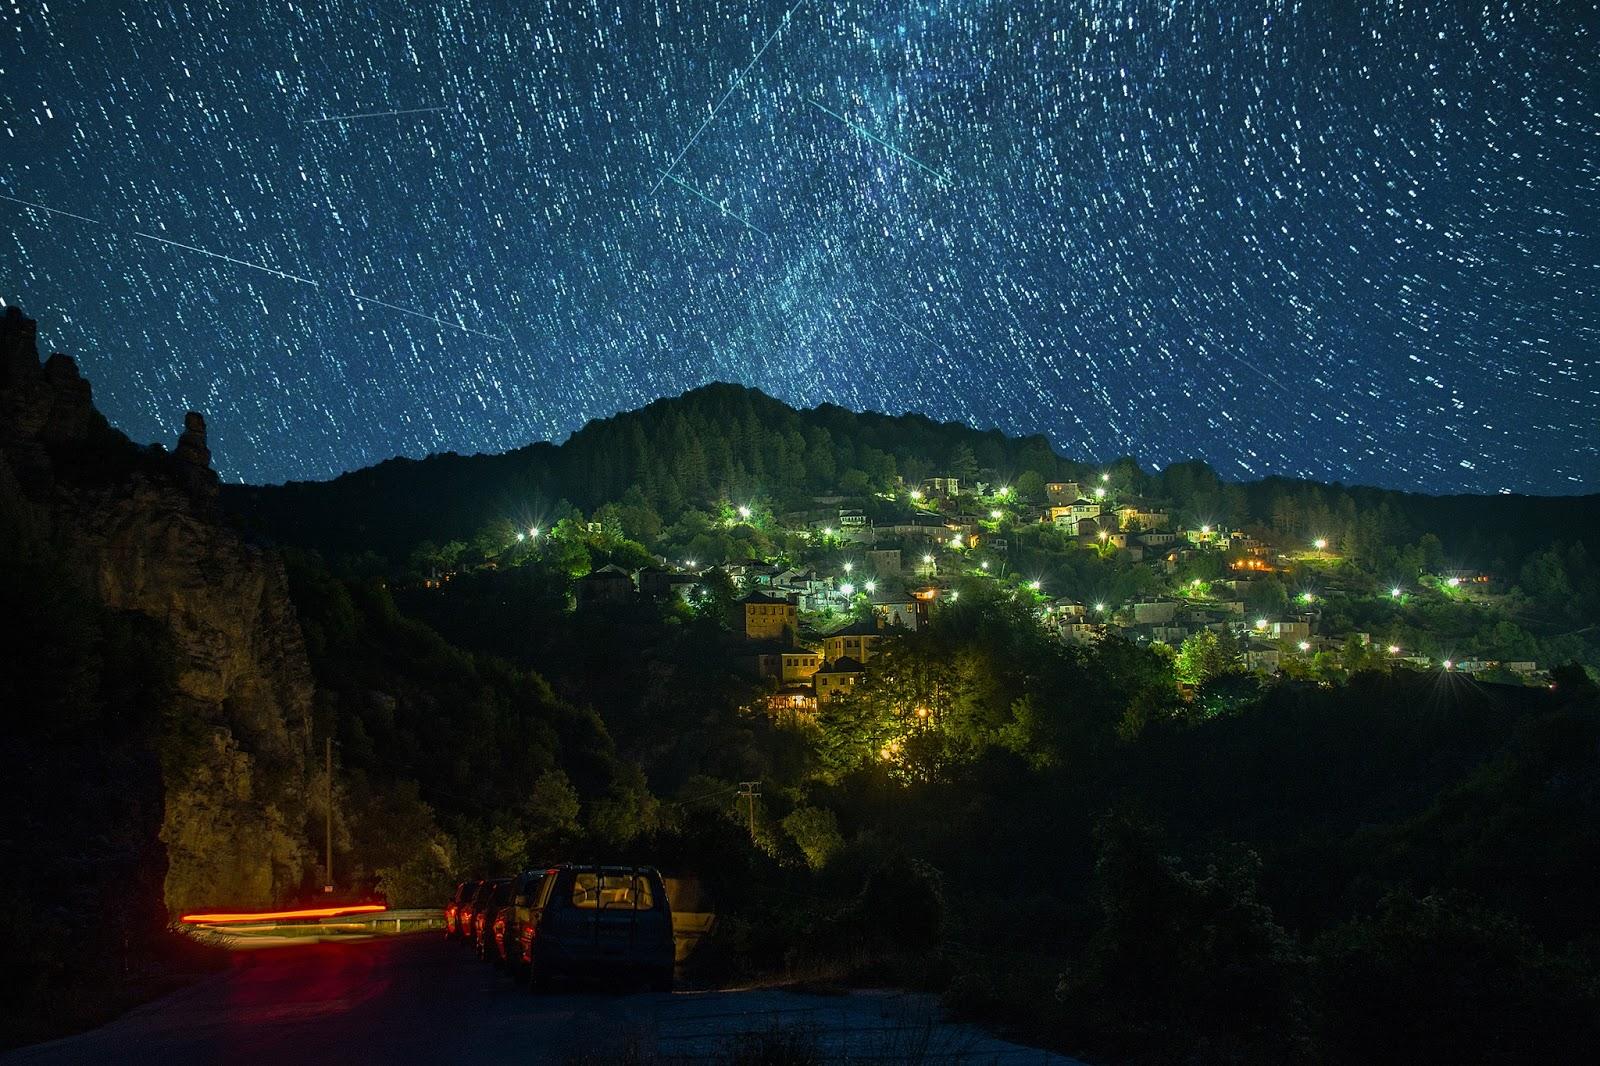 Photo Credit: Τσεργαλής Χριστόφορος